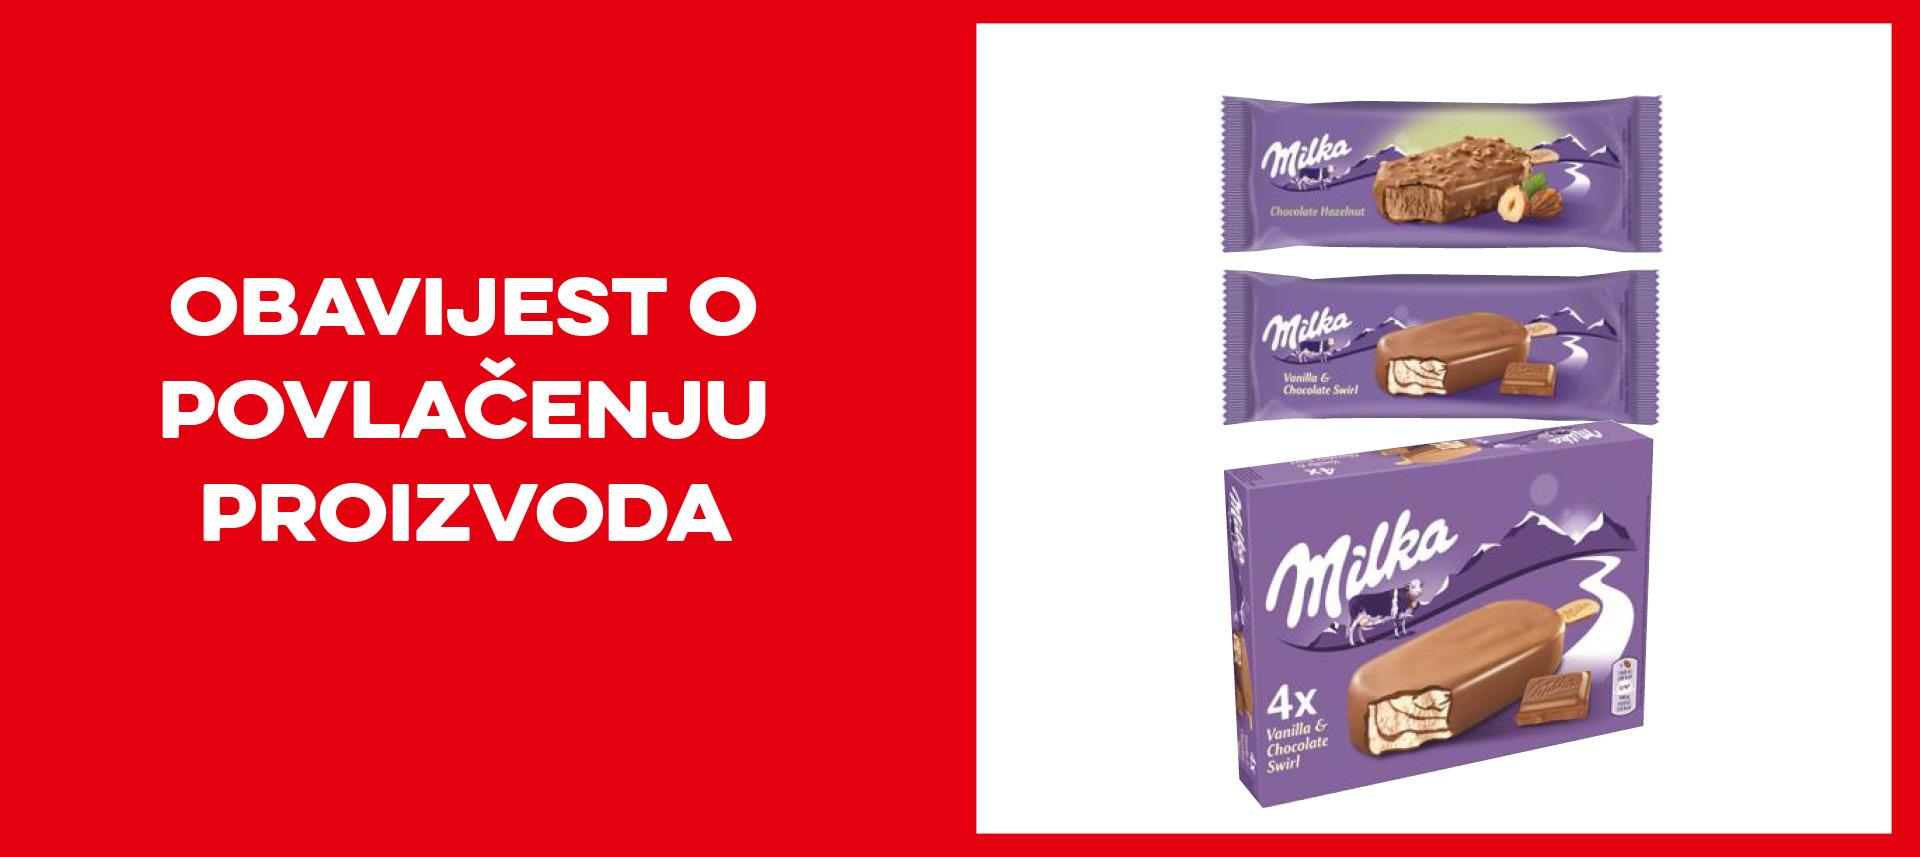 povlacenje proizvoda_milka.jpg